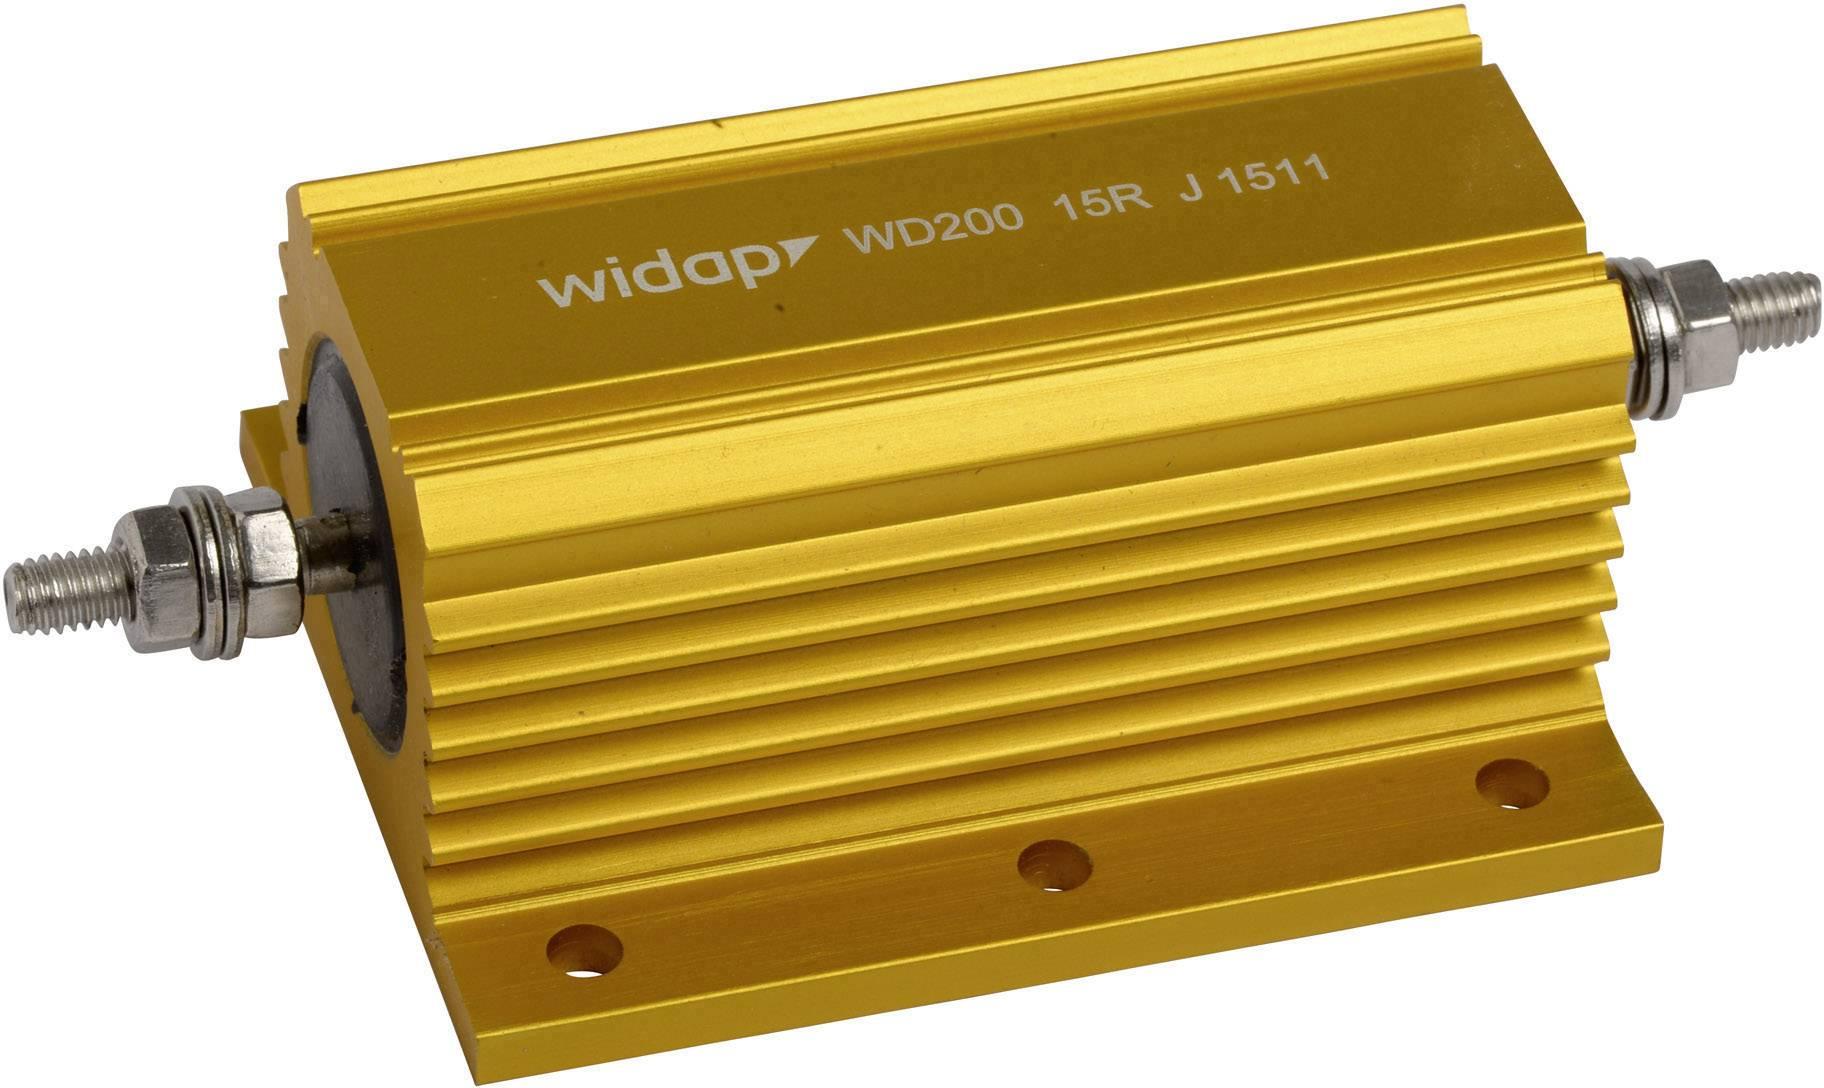 Drôtový rezistor Widap 160157, hodnota odporu 150 Ohm, 200 W, 1 ks